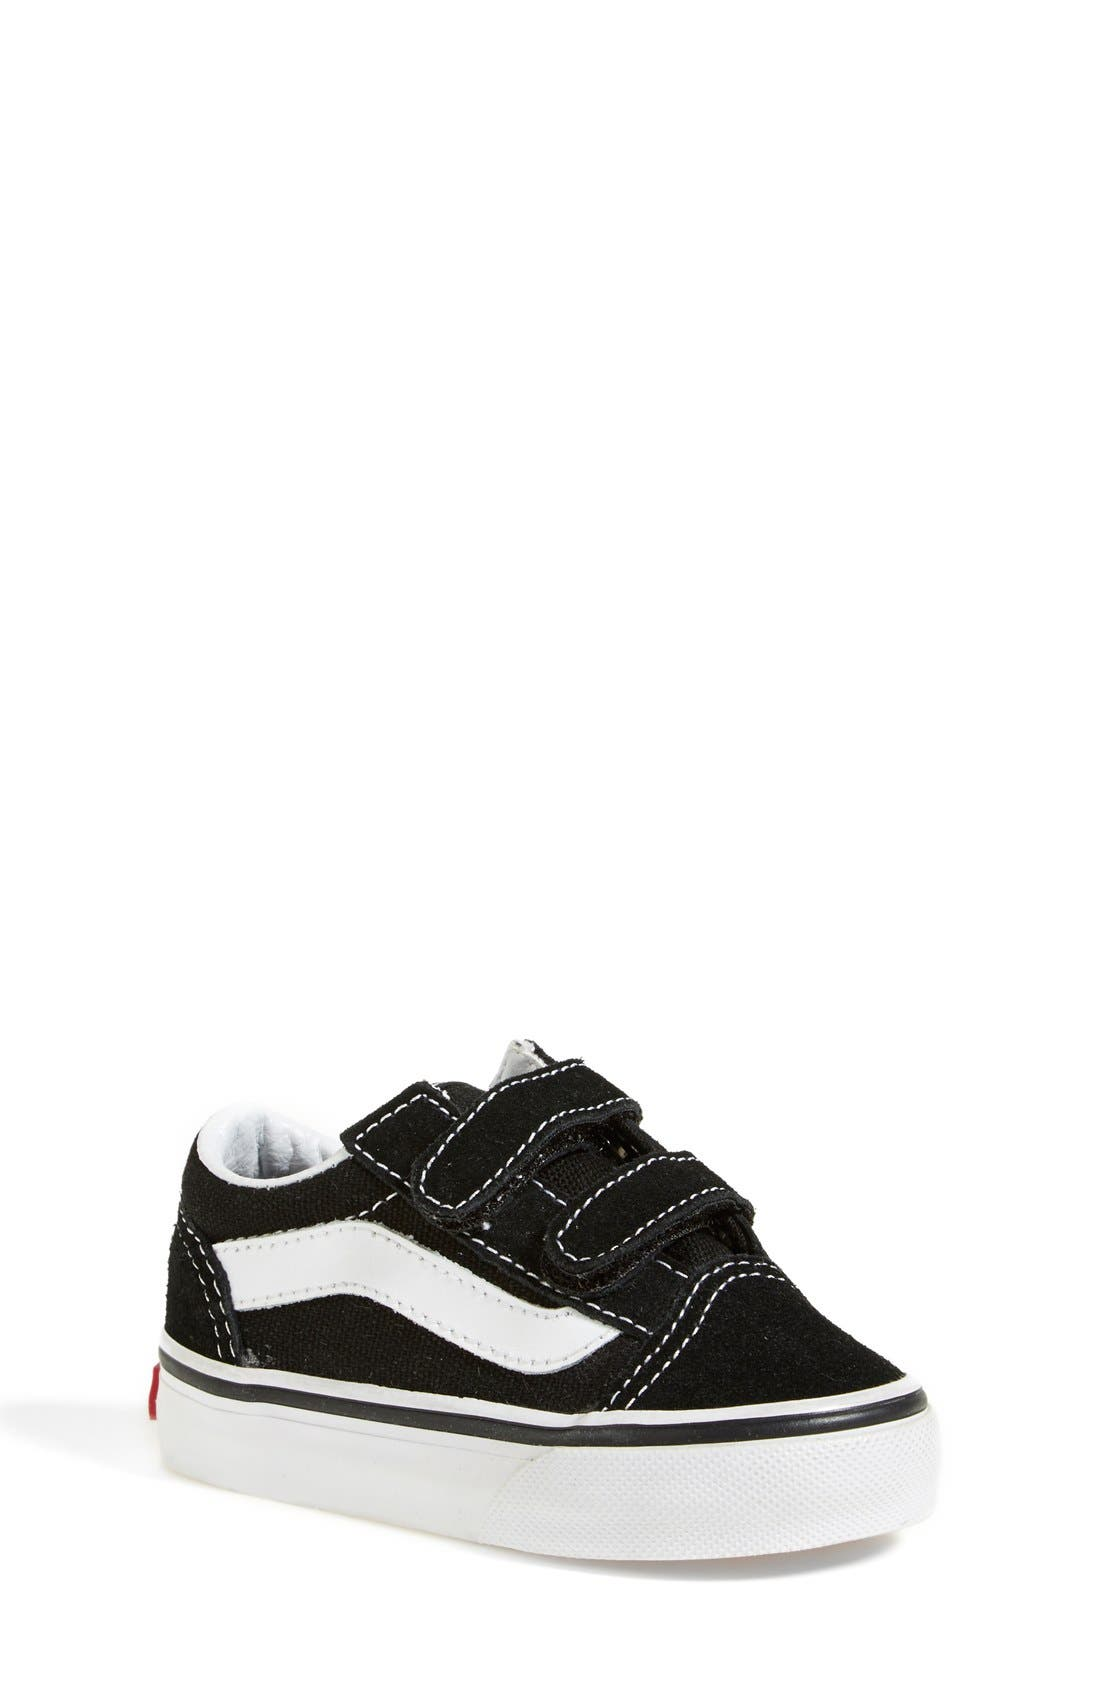 VANS 'Old Skool V' Sneaker, Main, color, BLACK/ TRUE WHITE